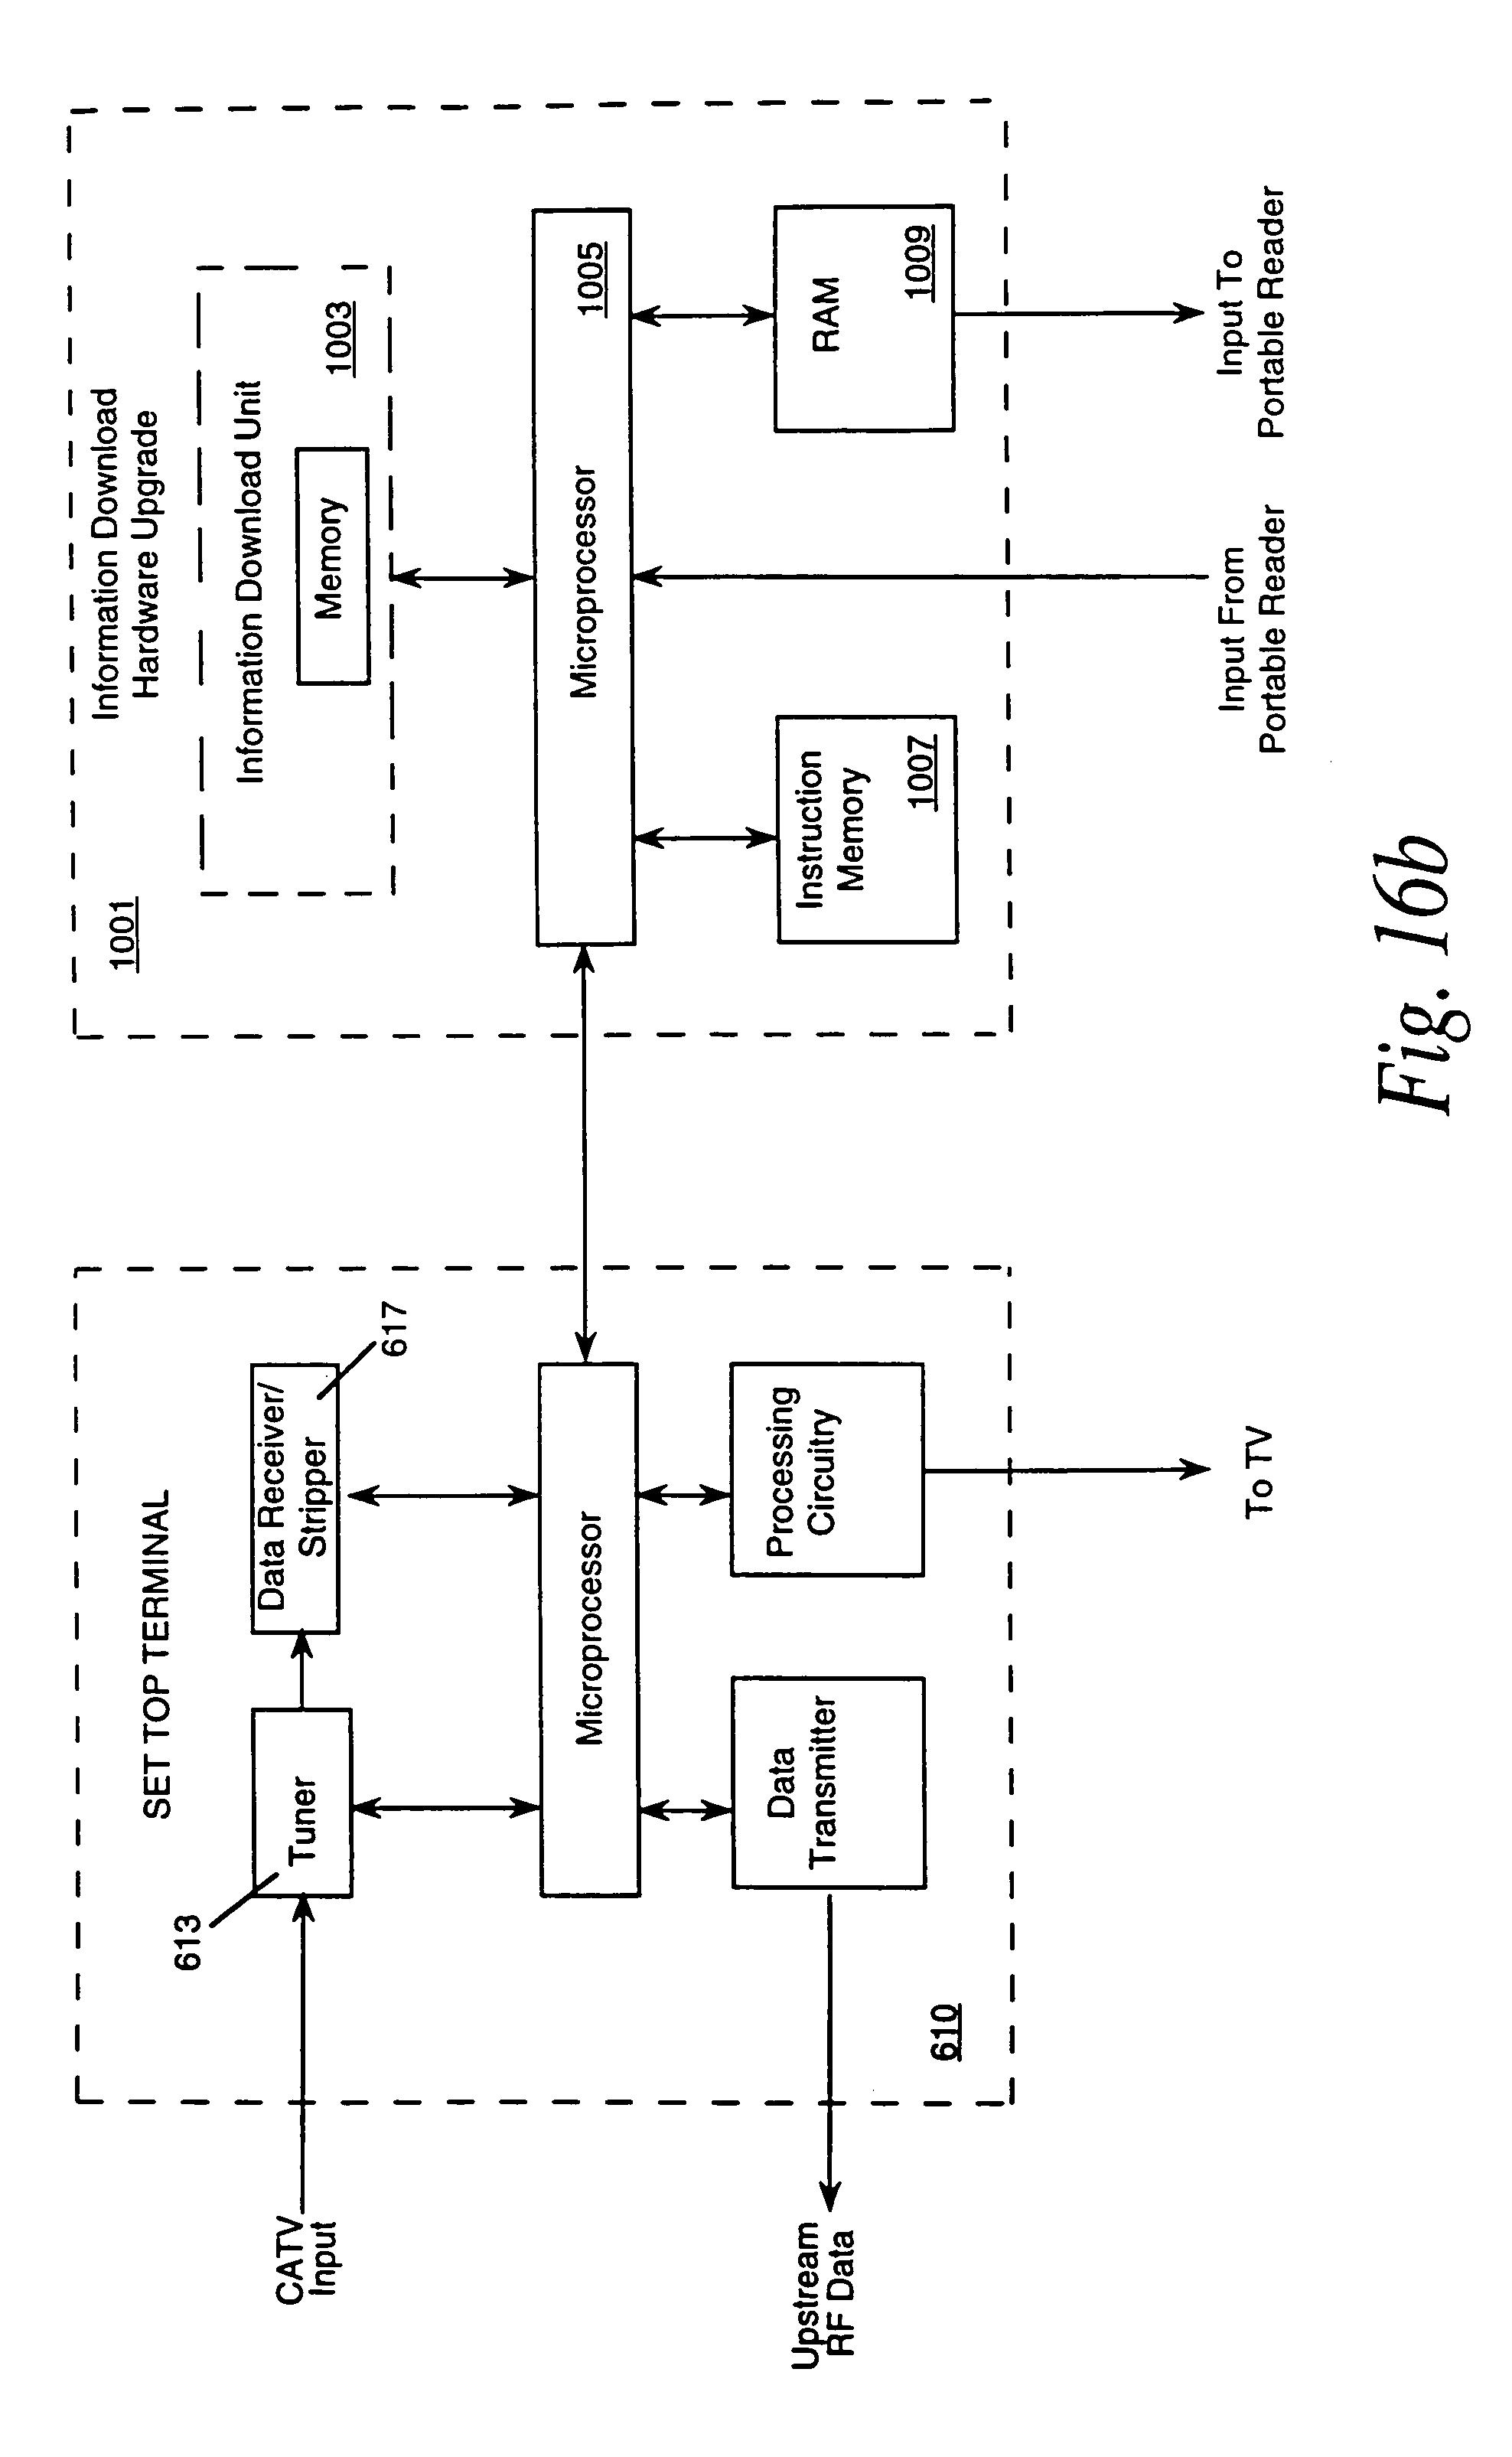 Patent US 7,861,166 B1